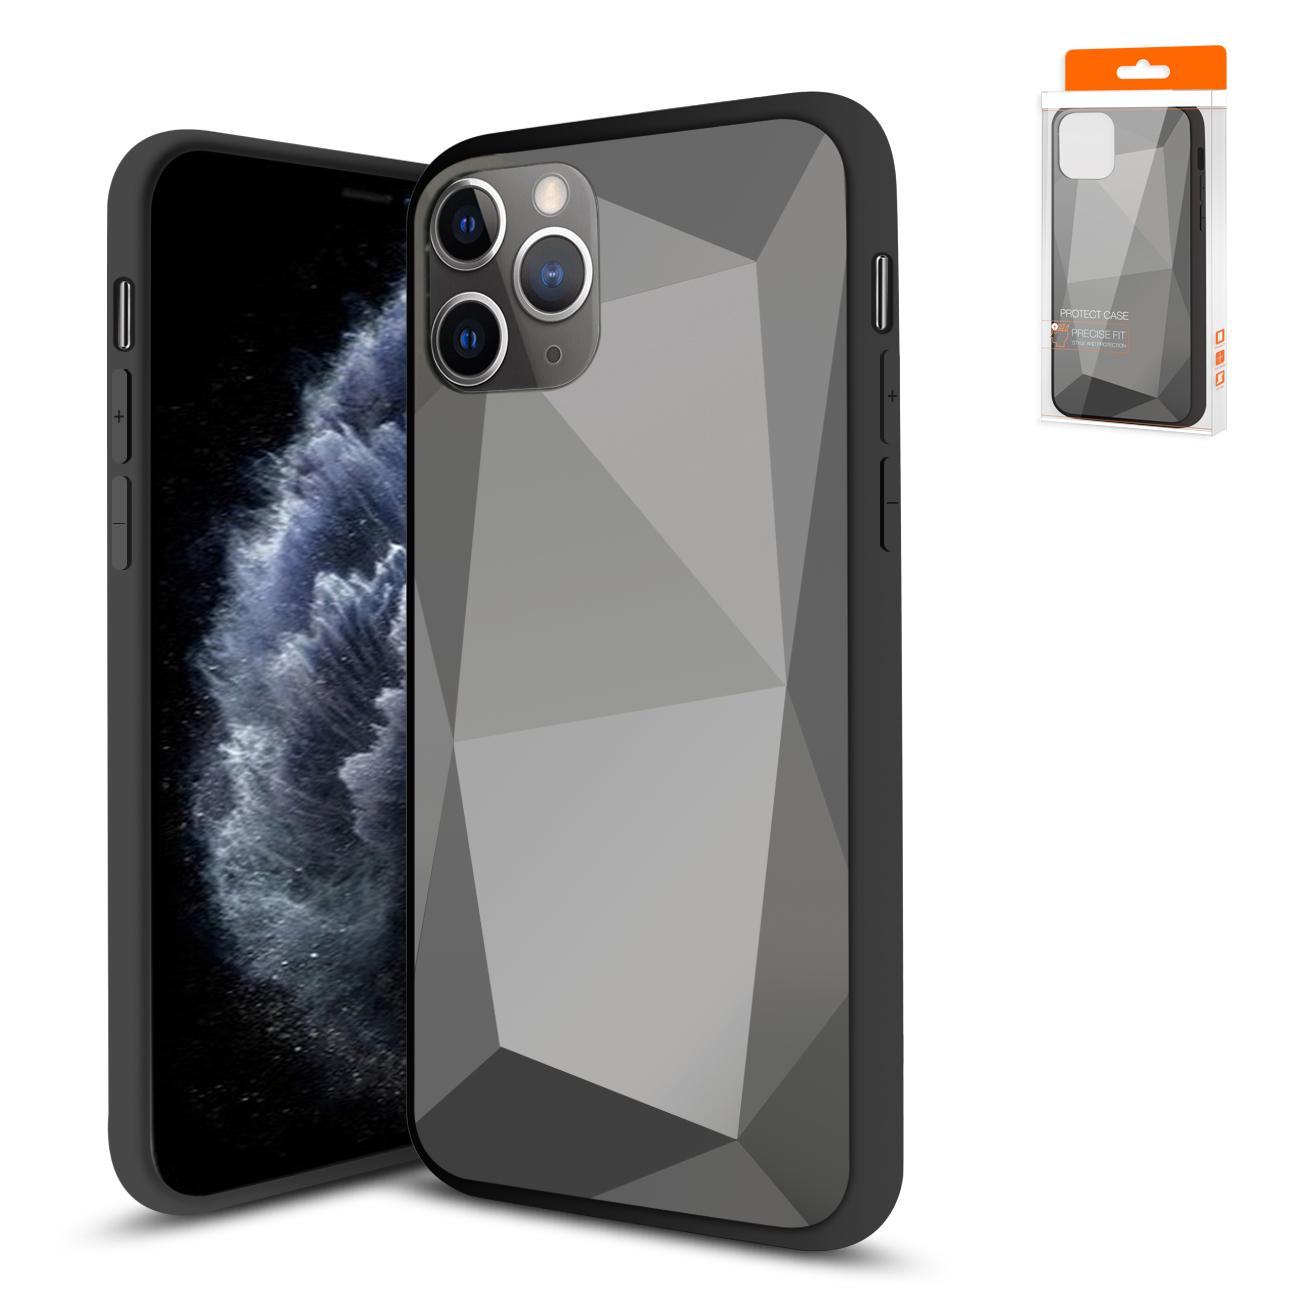 Apple iPhone 11 Pro Max Apple Diamond Cases In Black